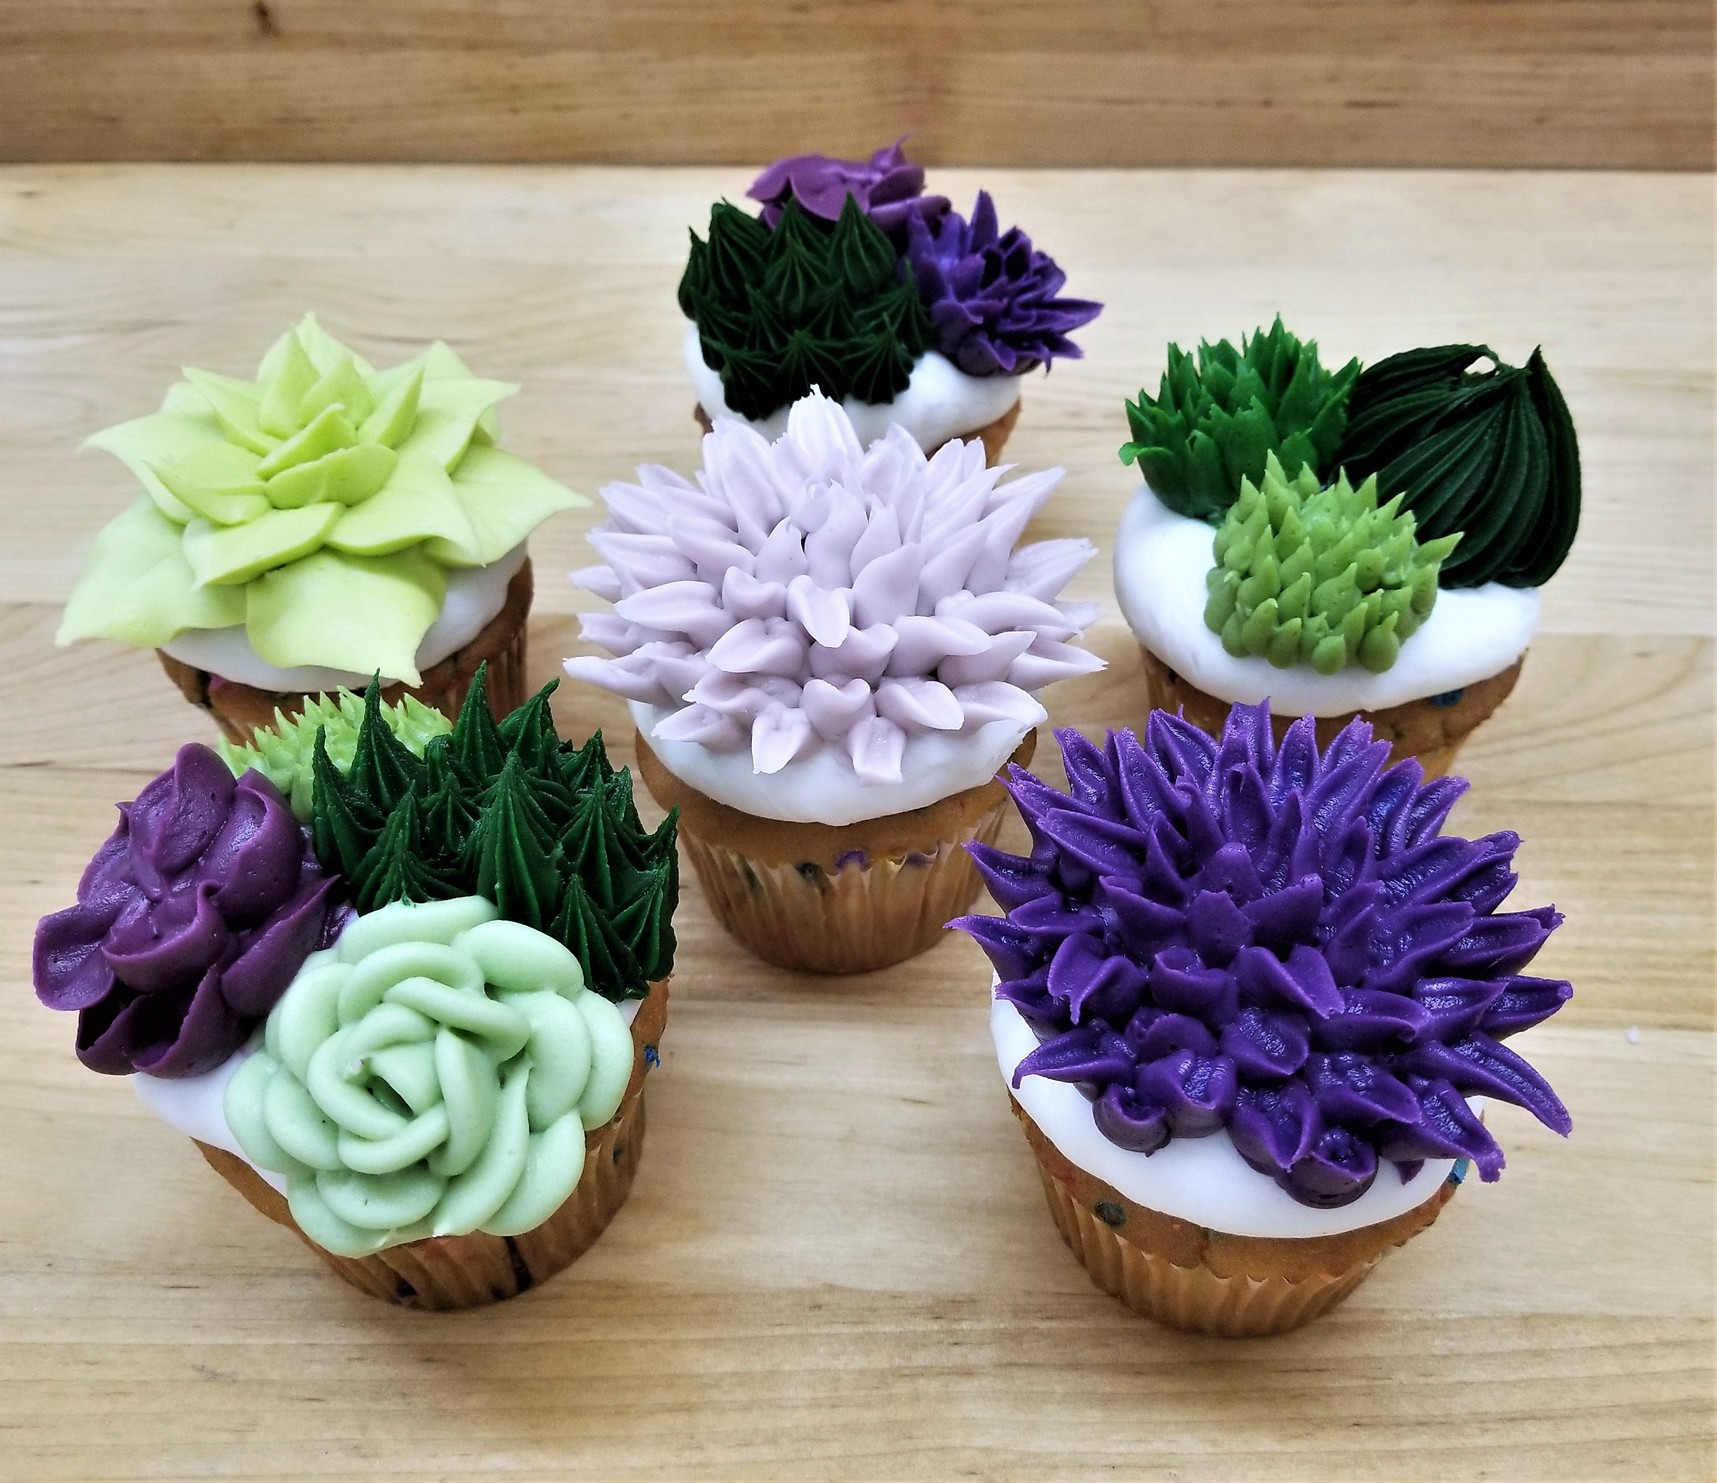 Succulent cupcakes are almost too beautiful to eat succulent cupcakes izmirmasajfo